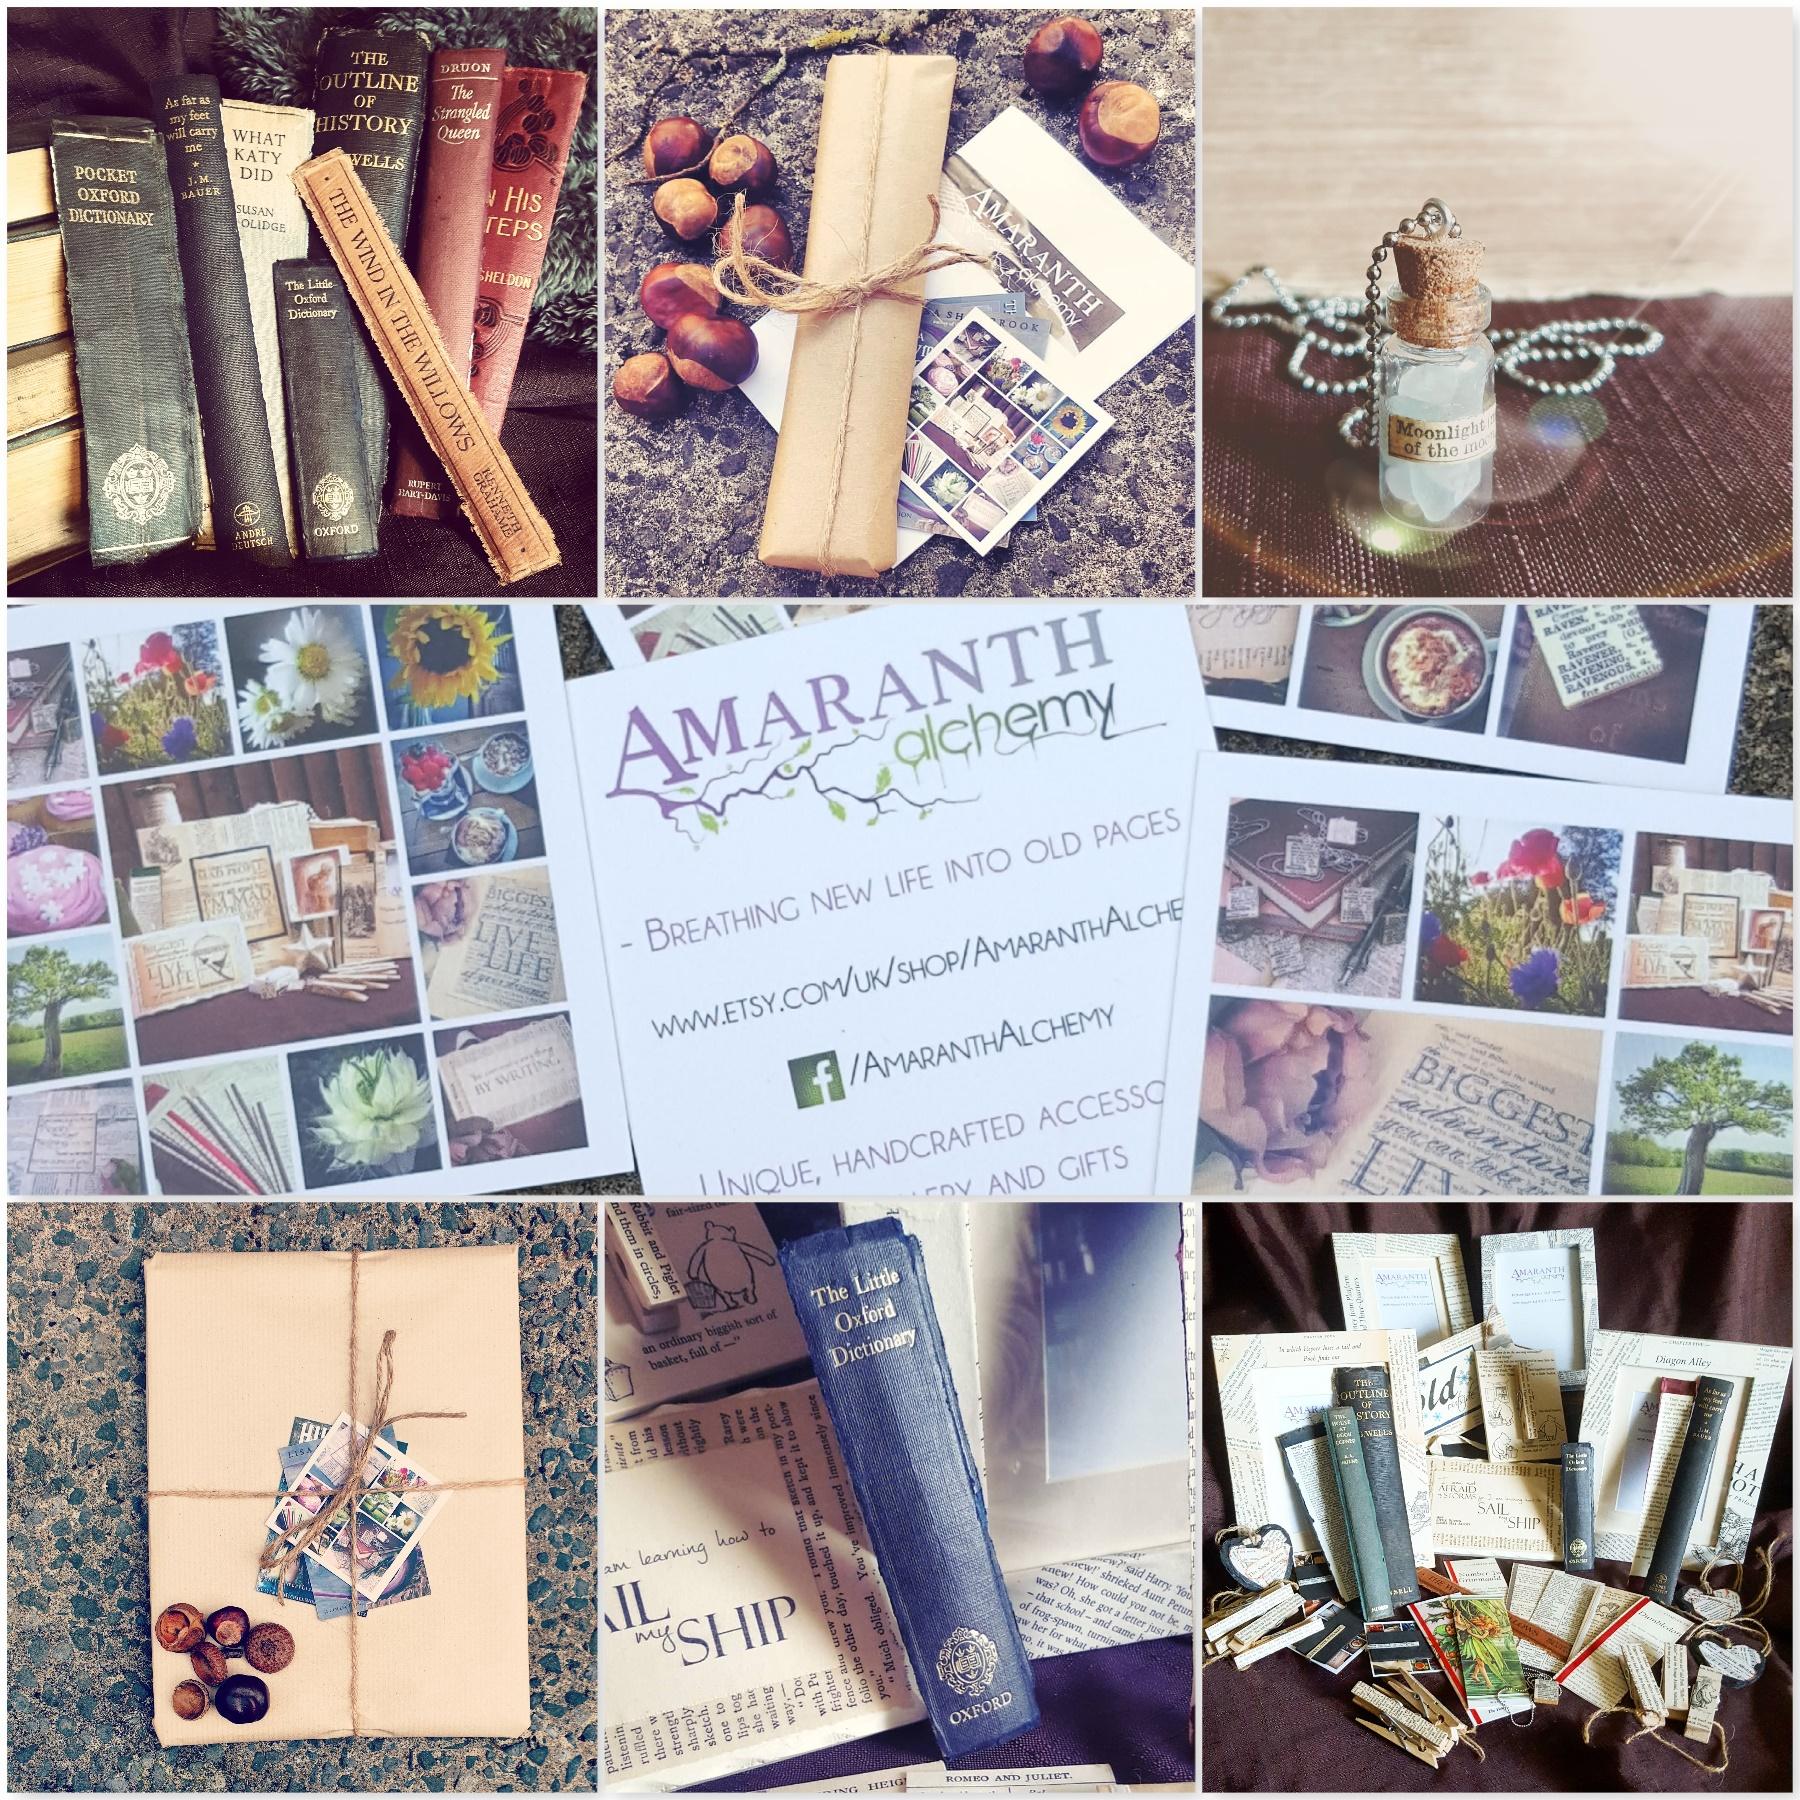 Amaranth Alchemy products